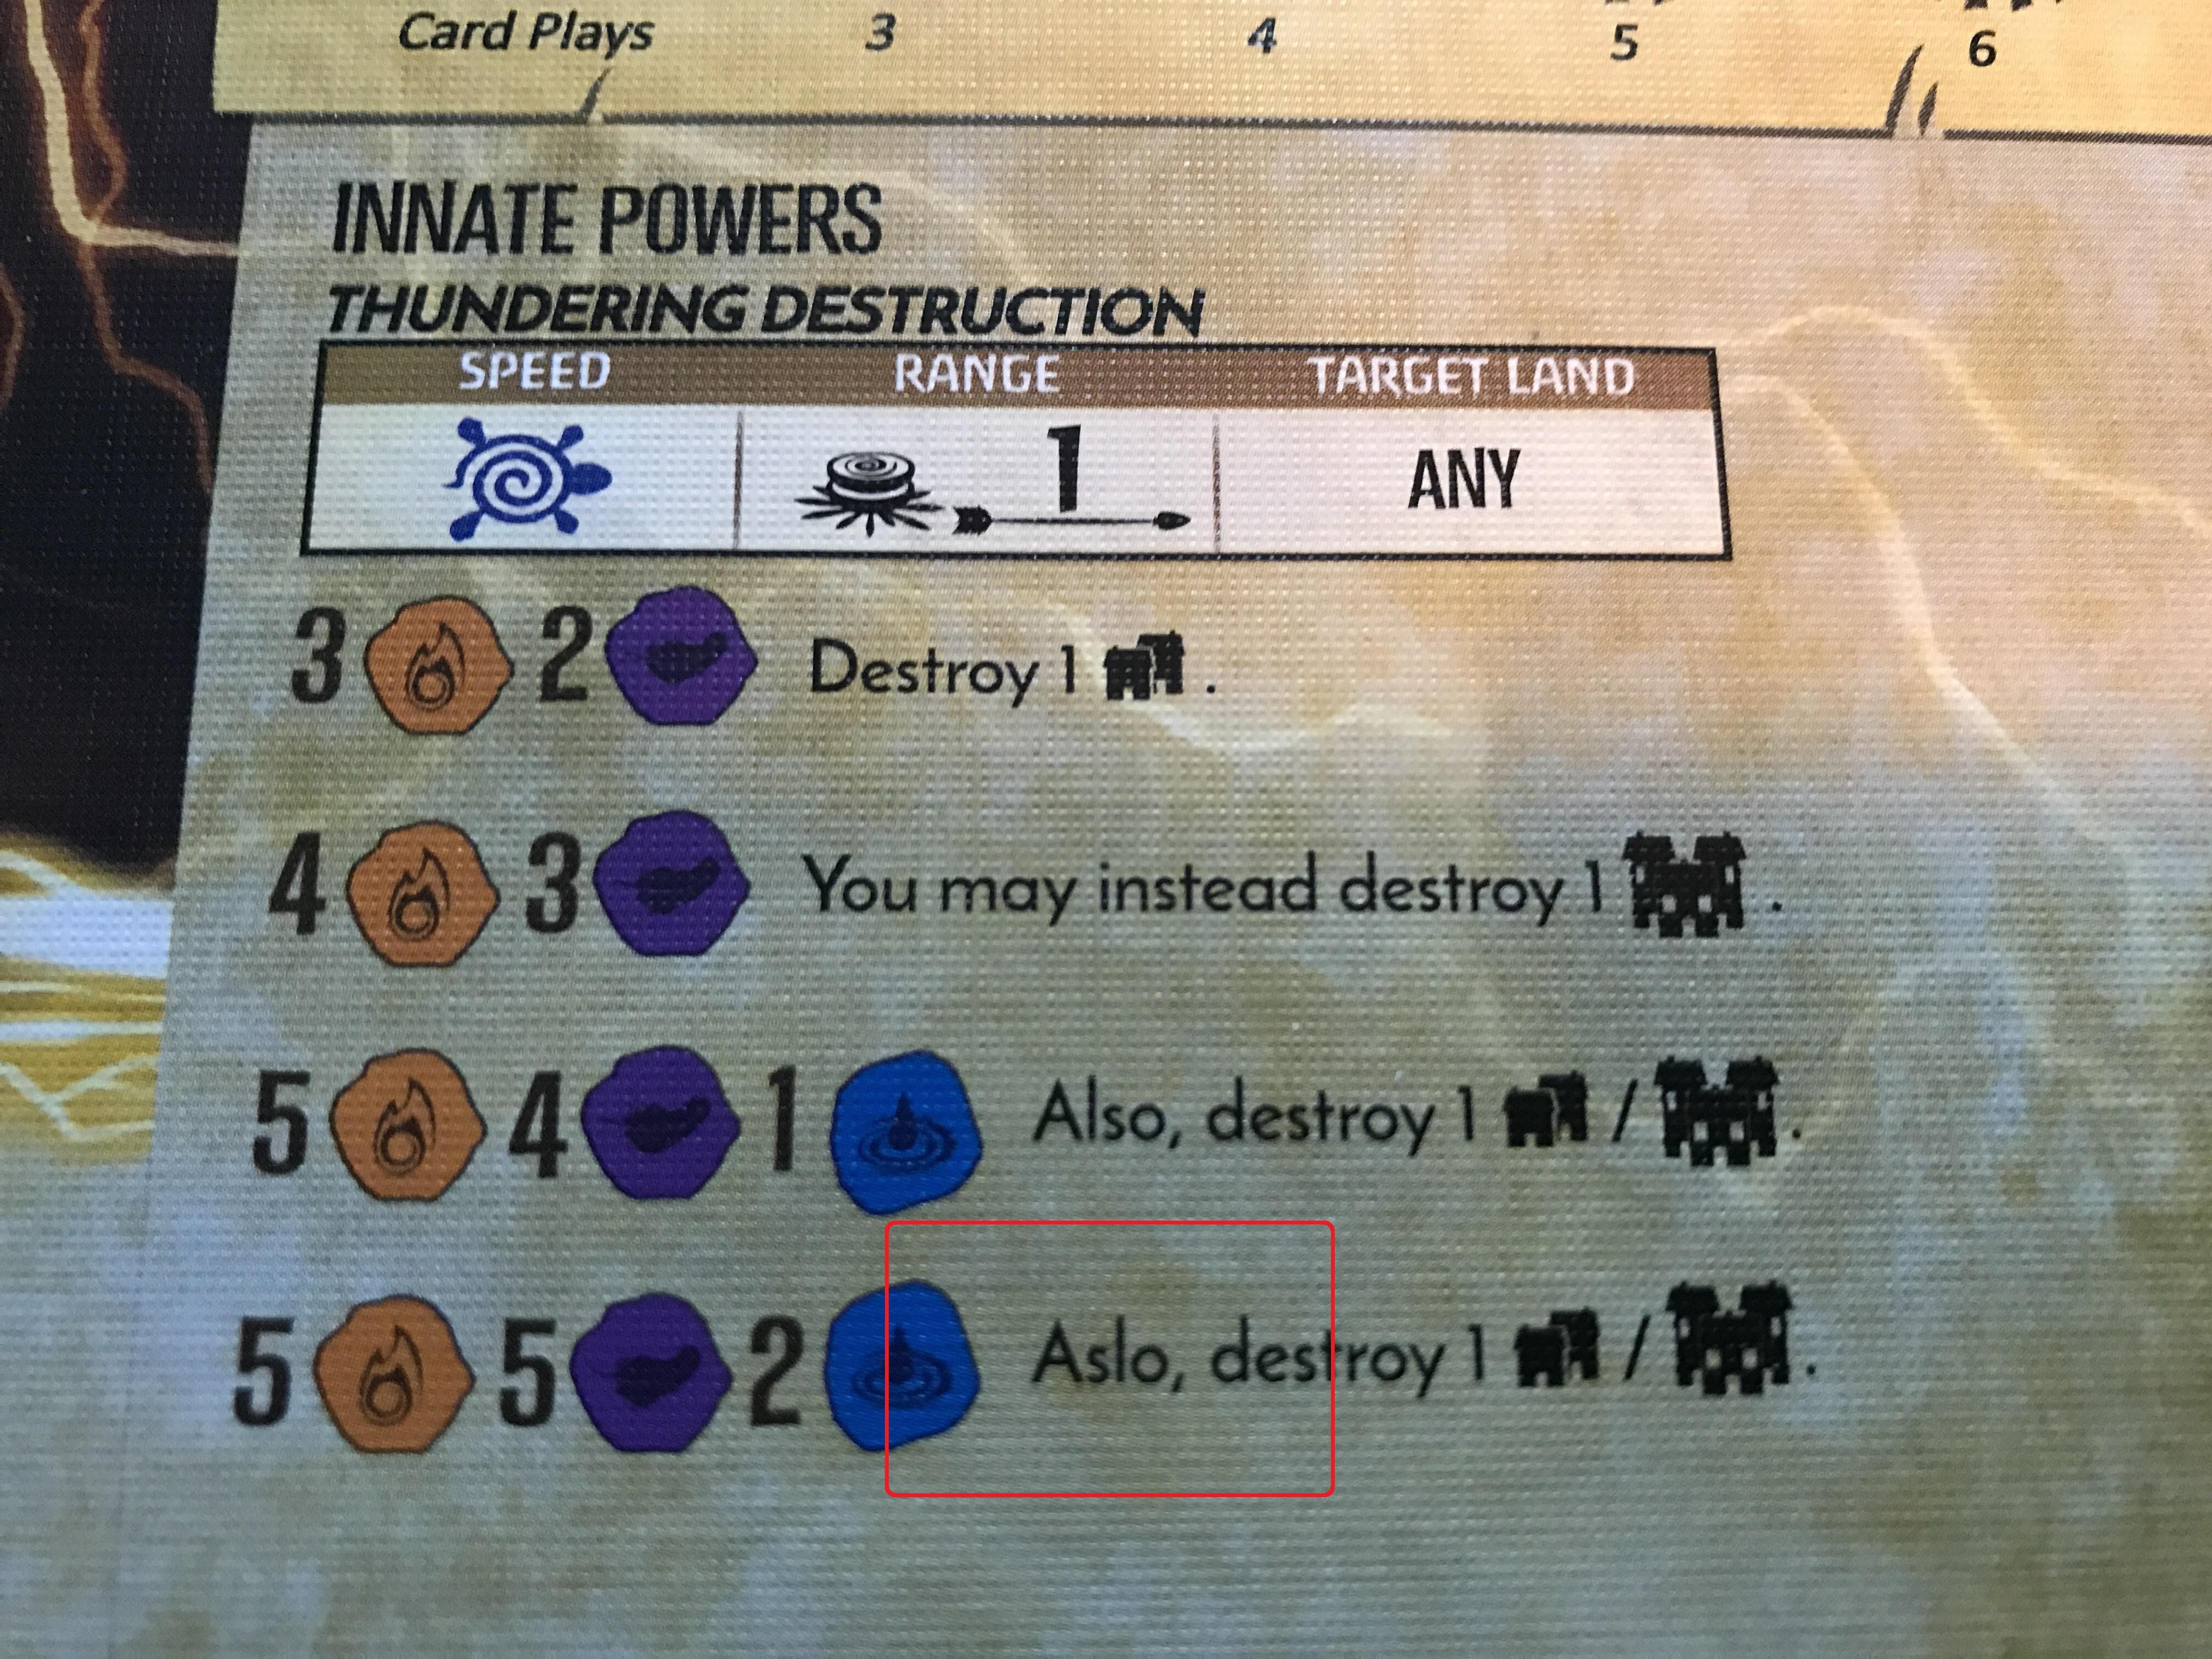 4th printing progression card misprints | Spirit Island | BoardGameGeek